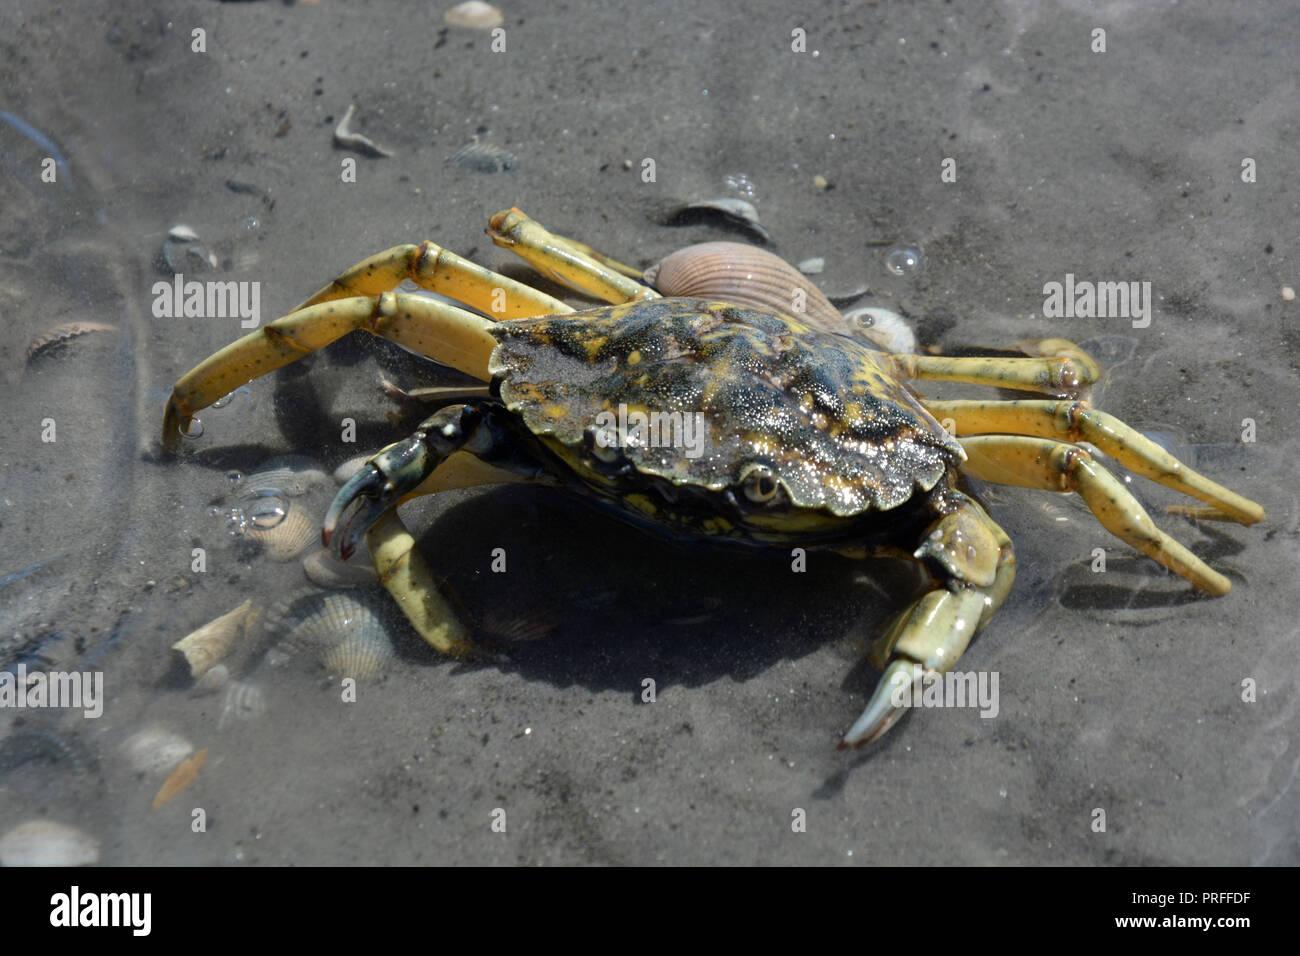 Taschenkrebs Krabbe Taschenkrebs Taschenkrebs Taschenkrebs  Krebs   Krabben - Stock Image